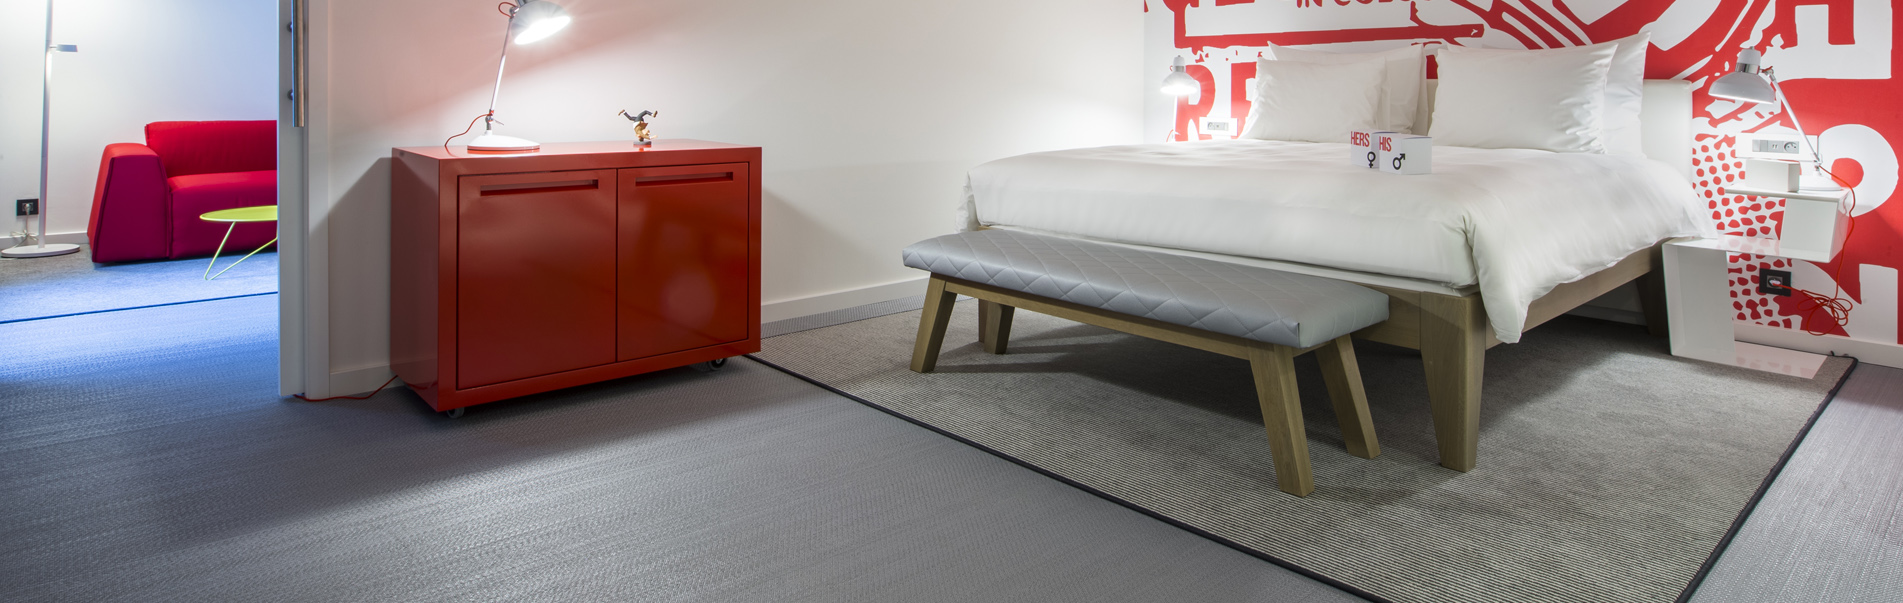 Radisson Red Brussels, Belgium - Gallery